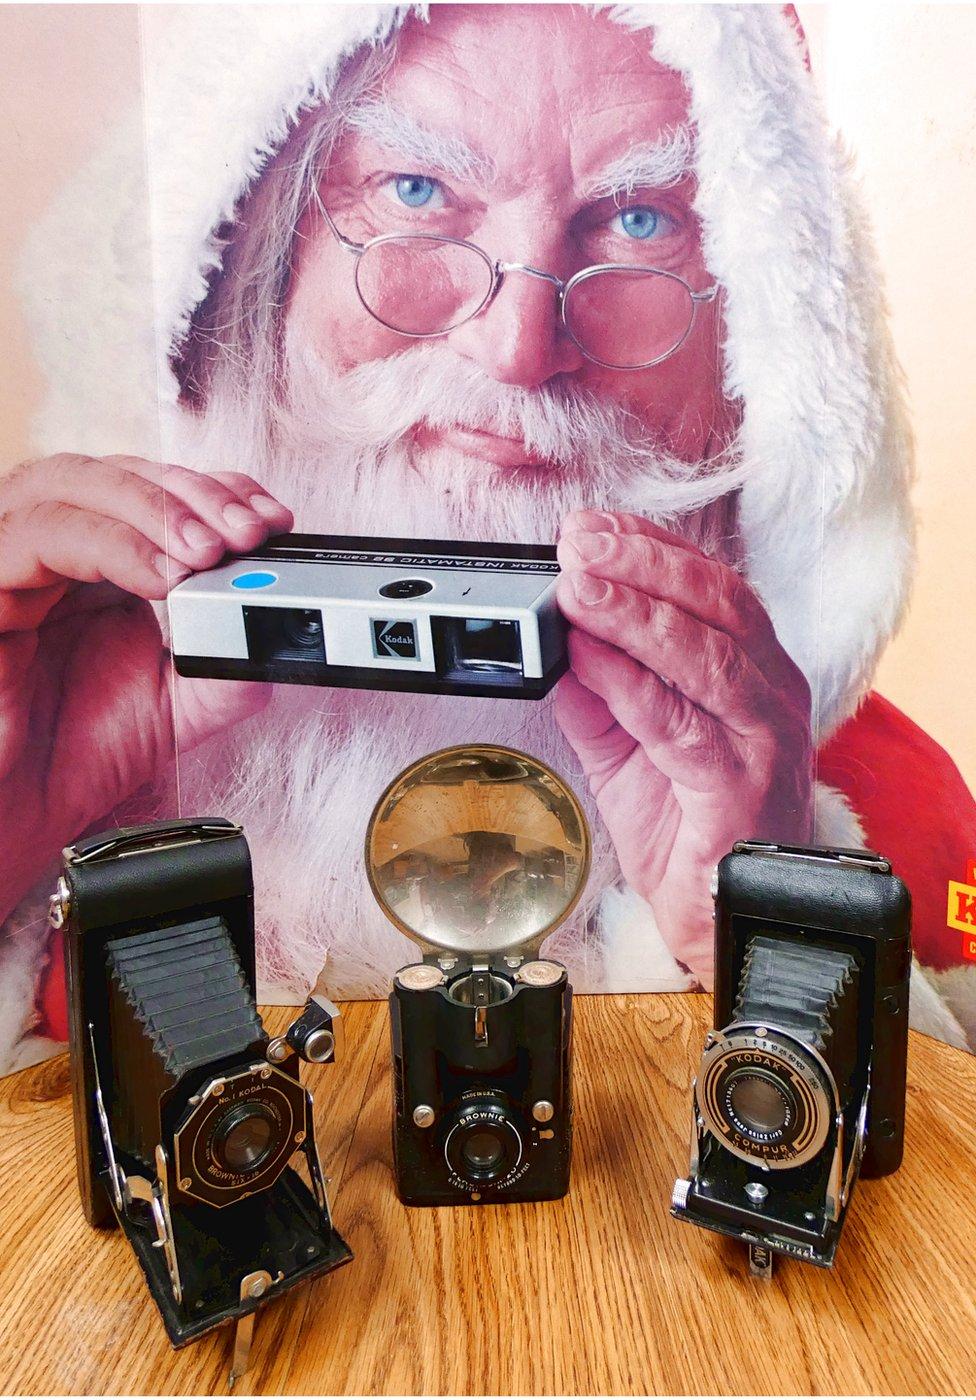 backdrop: advert for Kodak instamatic camera. Foreground, left to right: No.1 Kodal, Brownie Pliant, Six-16 folding camera (USA); Brownie Flash, Six-20, c.1941; Kodak Regent, Compur shutter, Zeiss Tessar lens, folding camera, c.1935-39 (Germany)